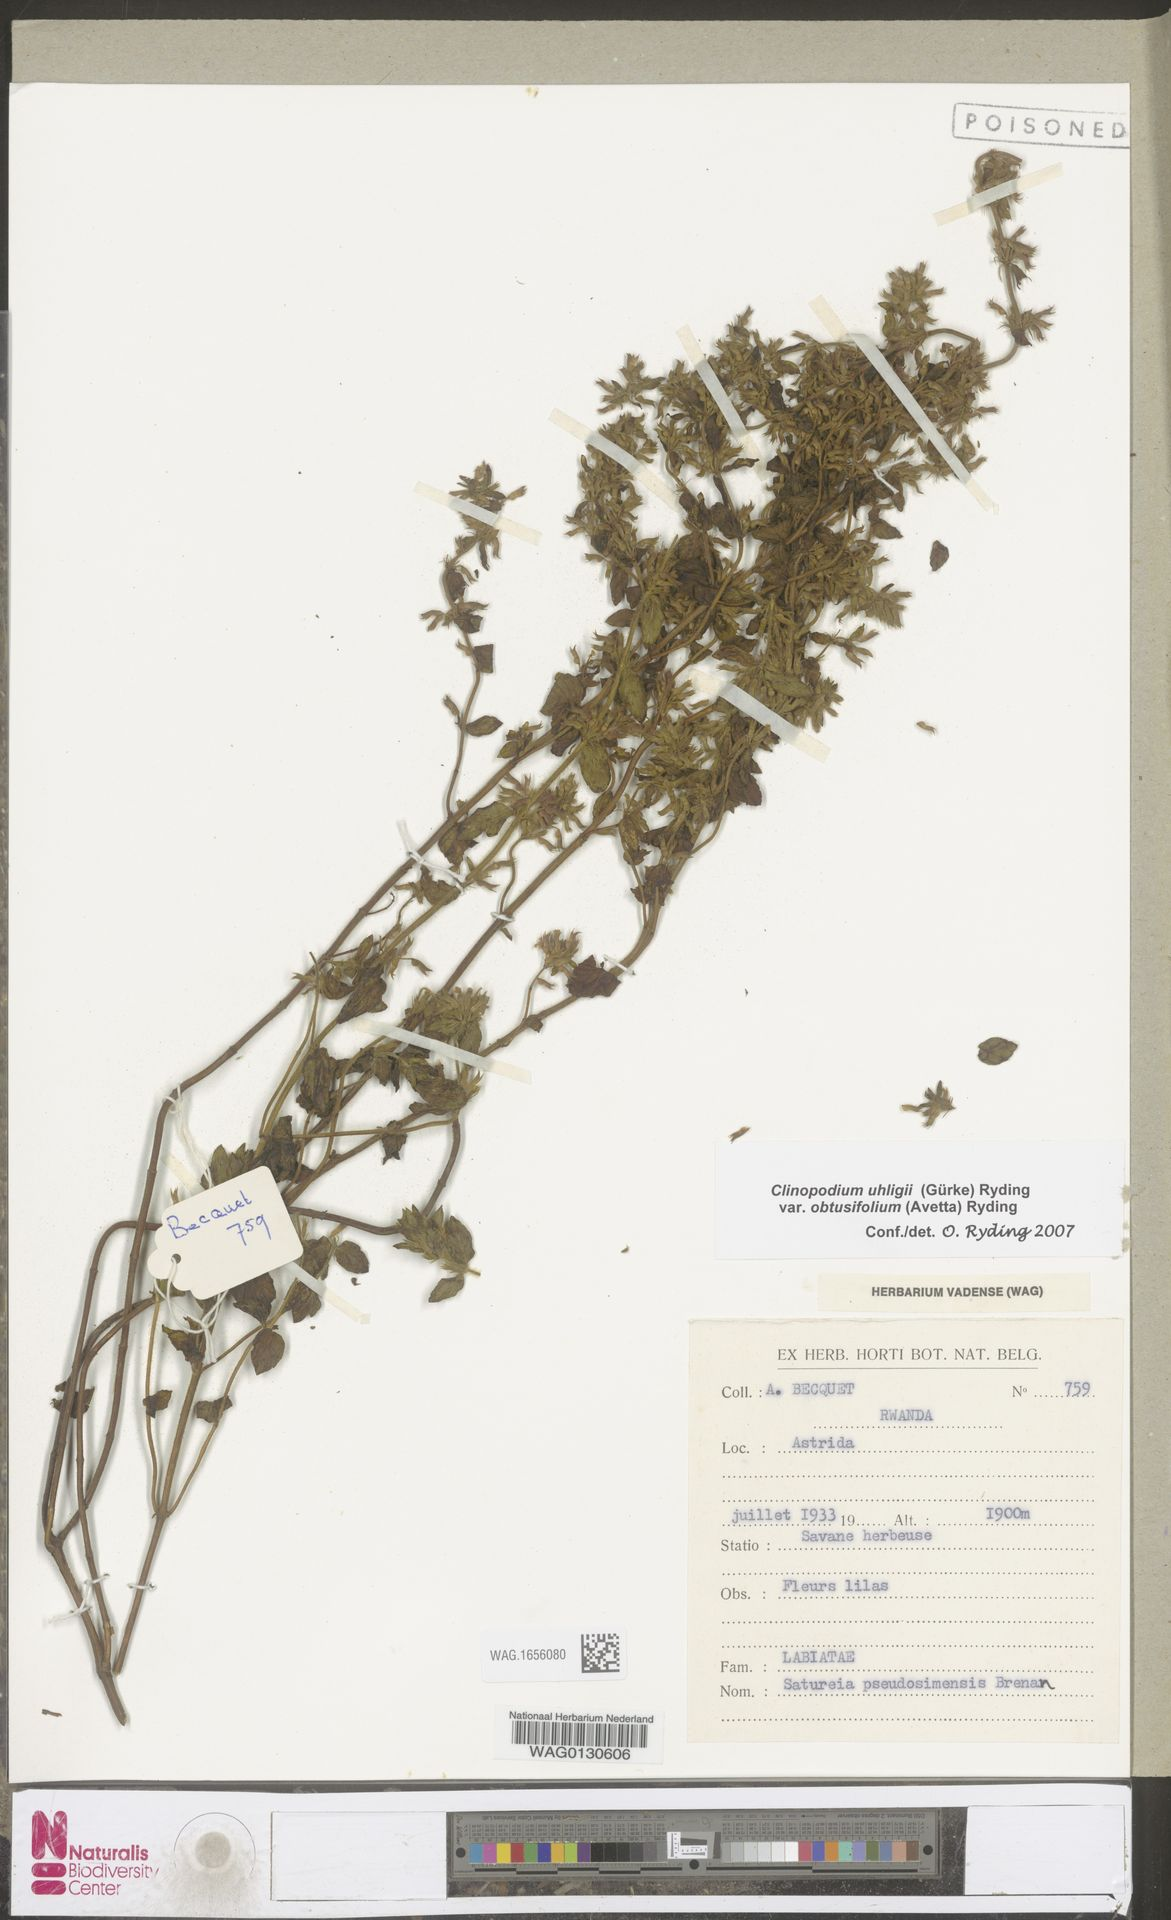 WAG.1656080 | Clinopodium uhligii var. obtusifolium (Avetta) Ryding